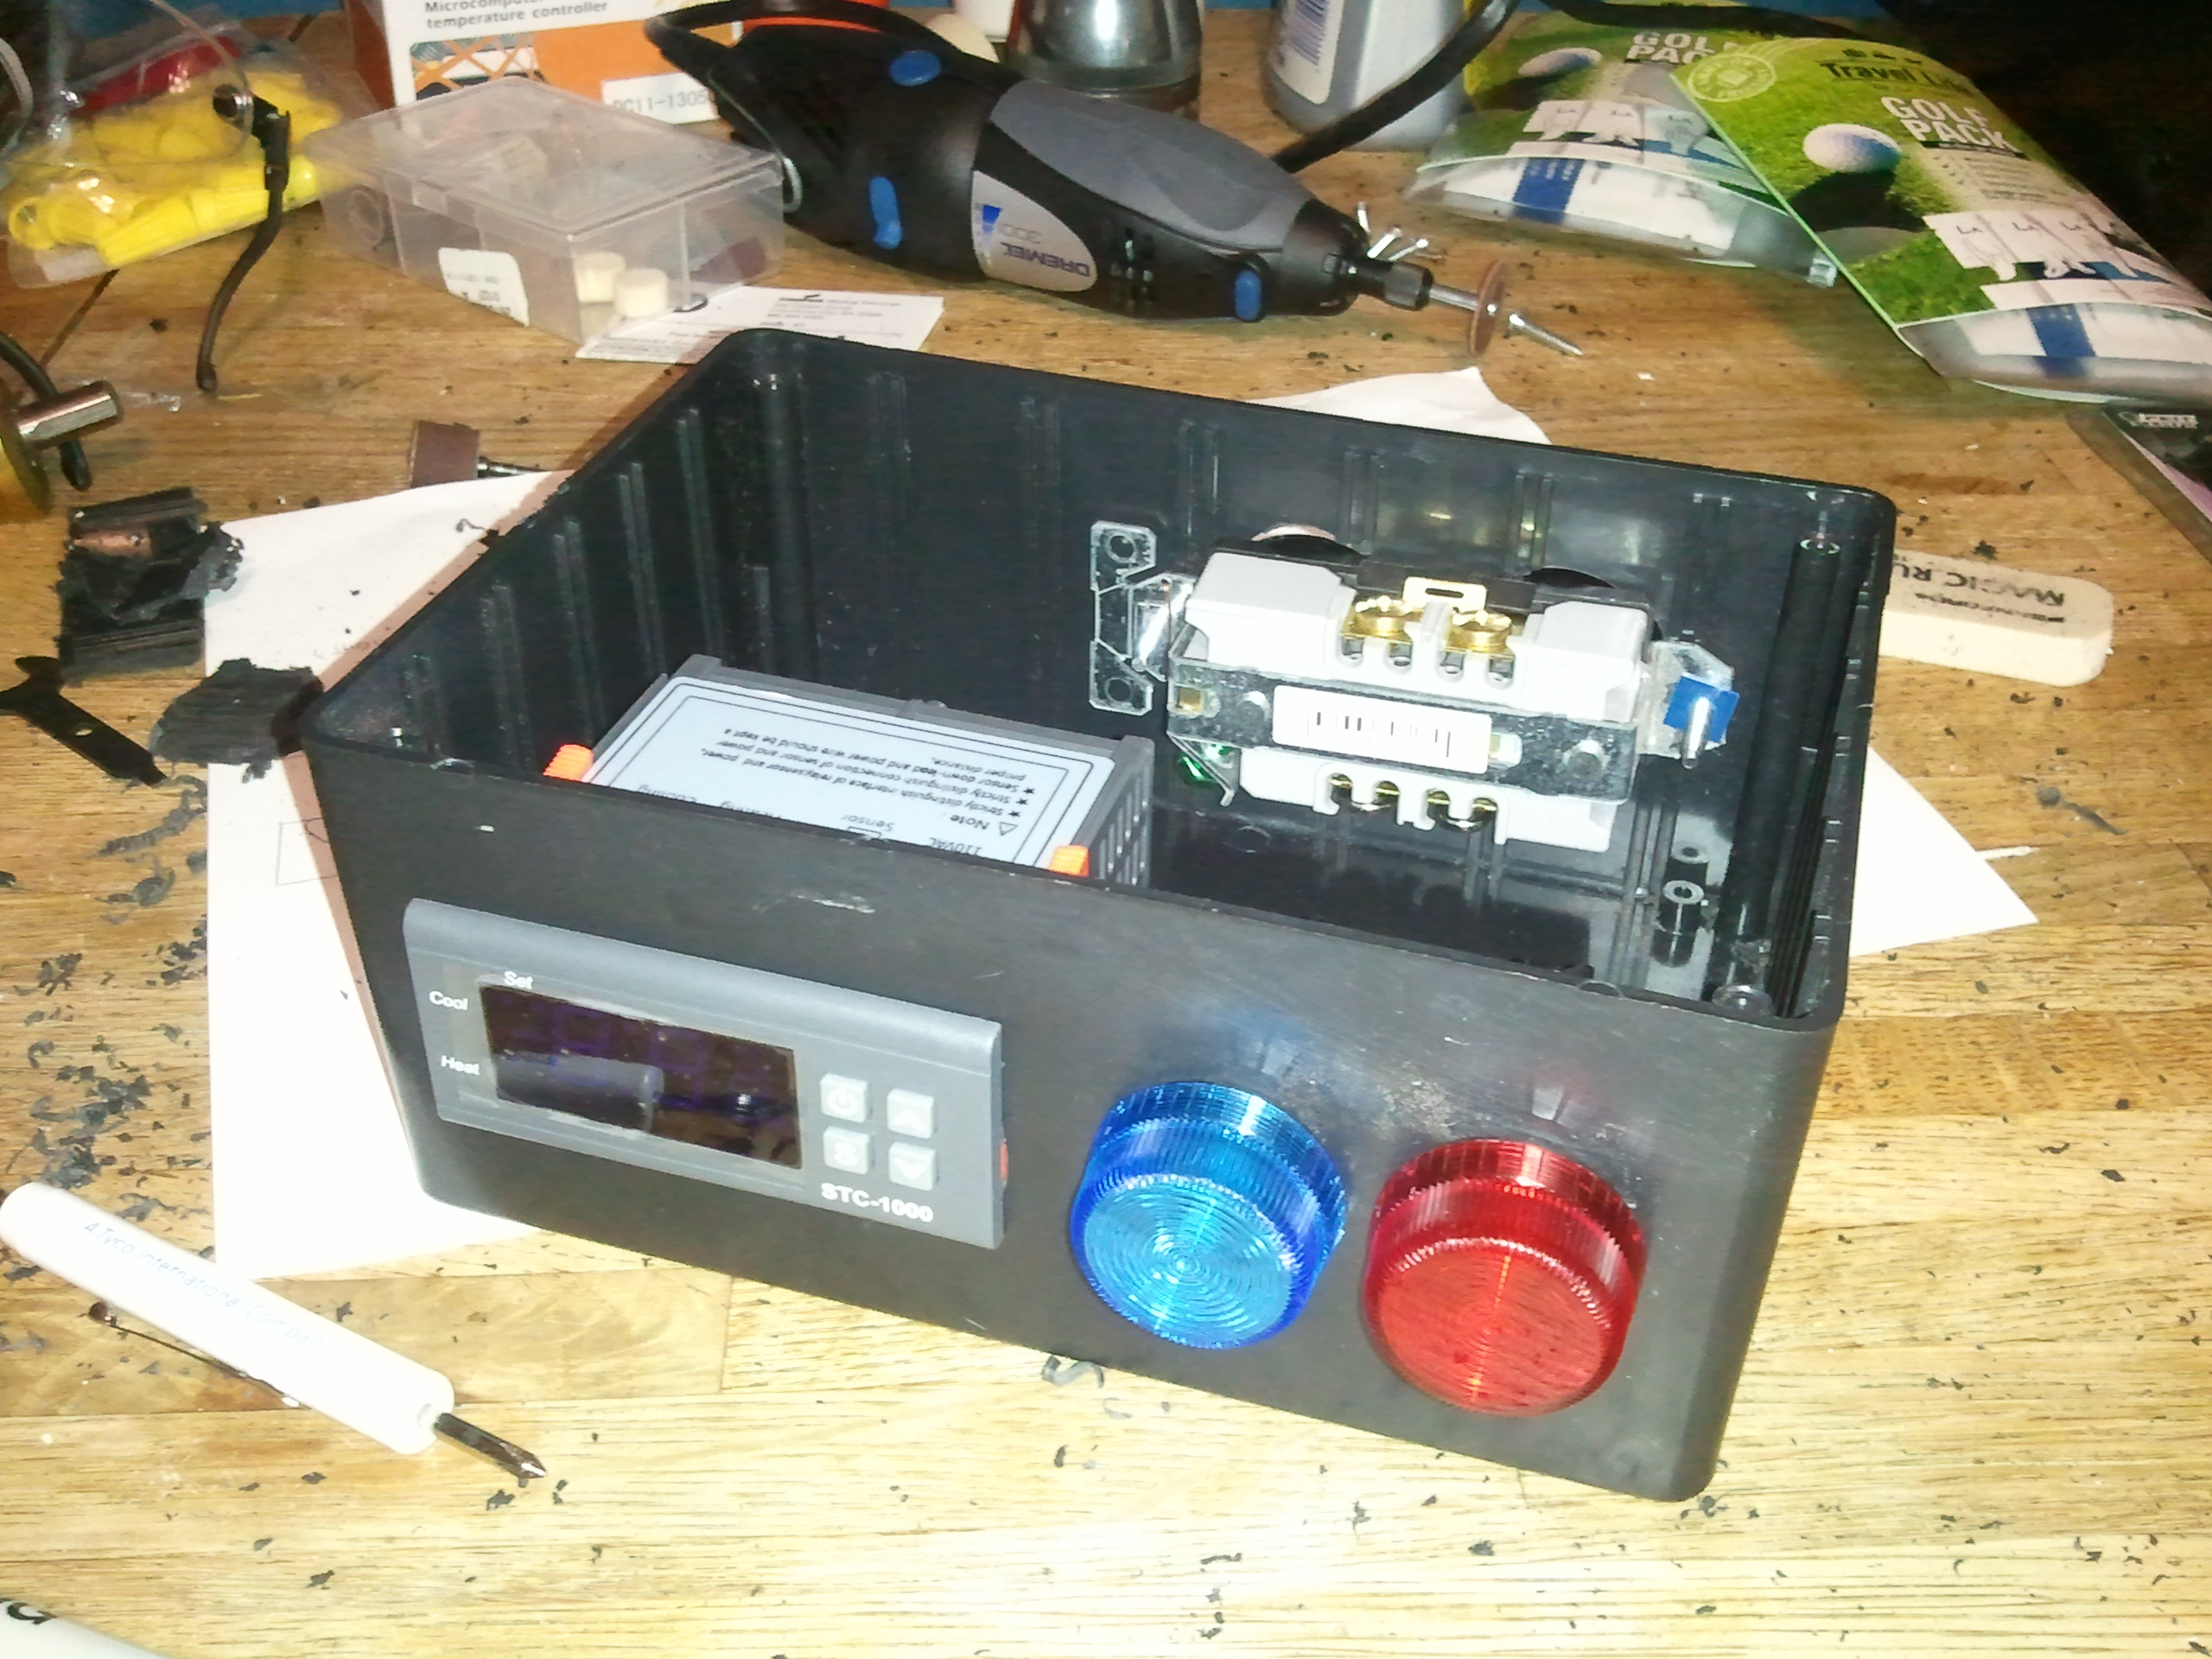 stc 1000 temperature controller wiring honda mt50 diagram diy 2 stage